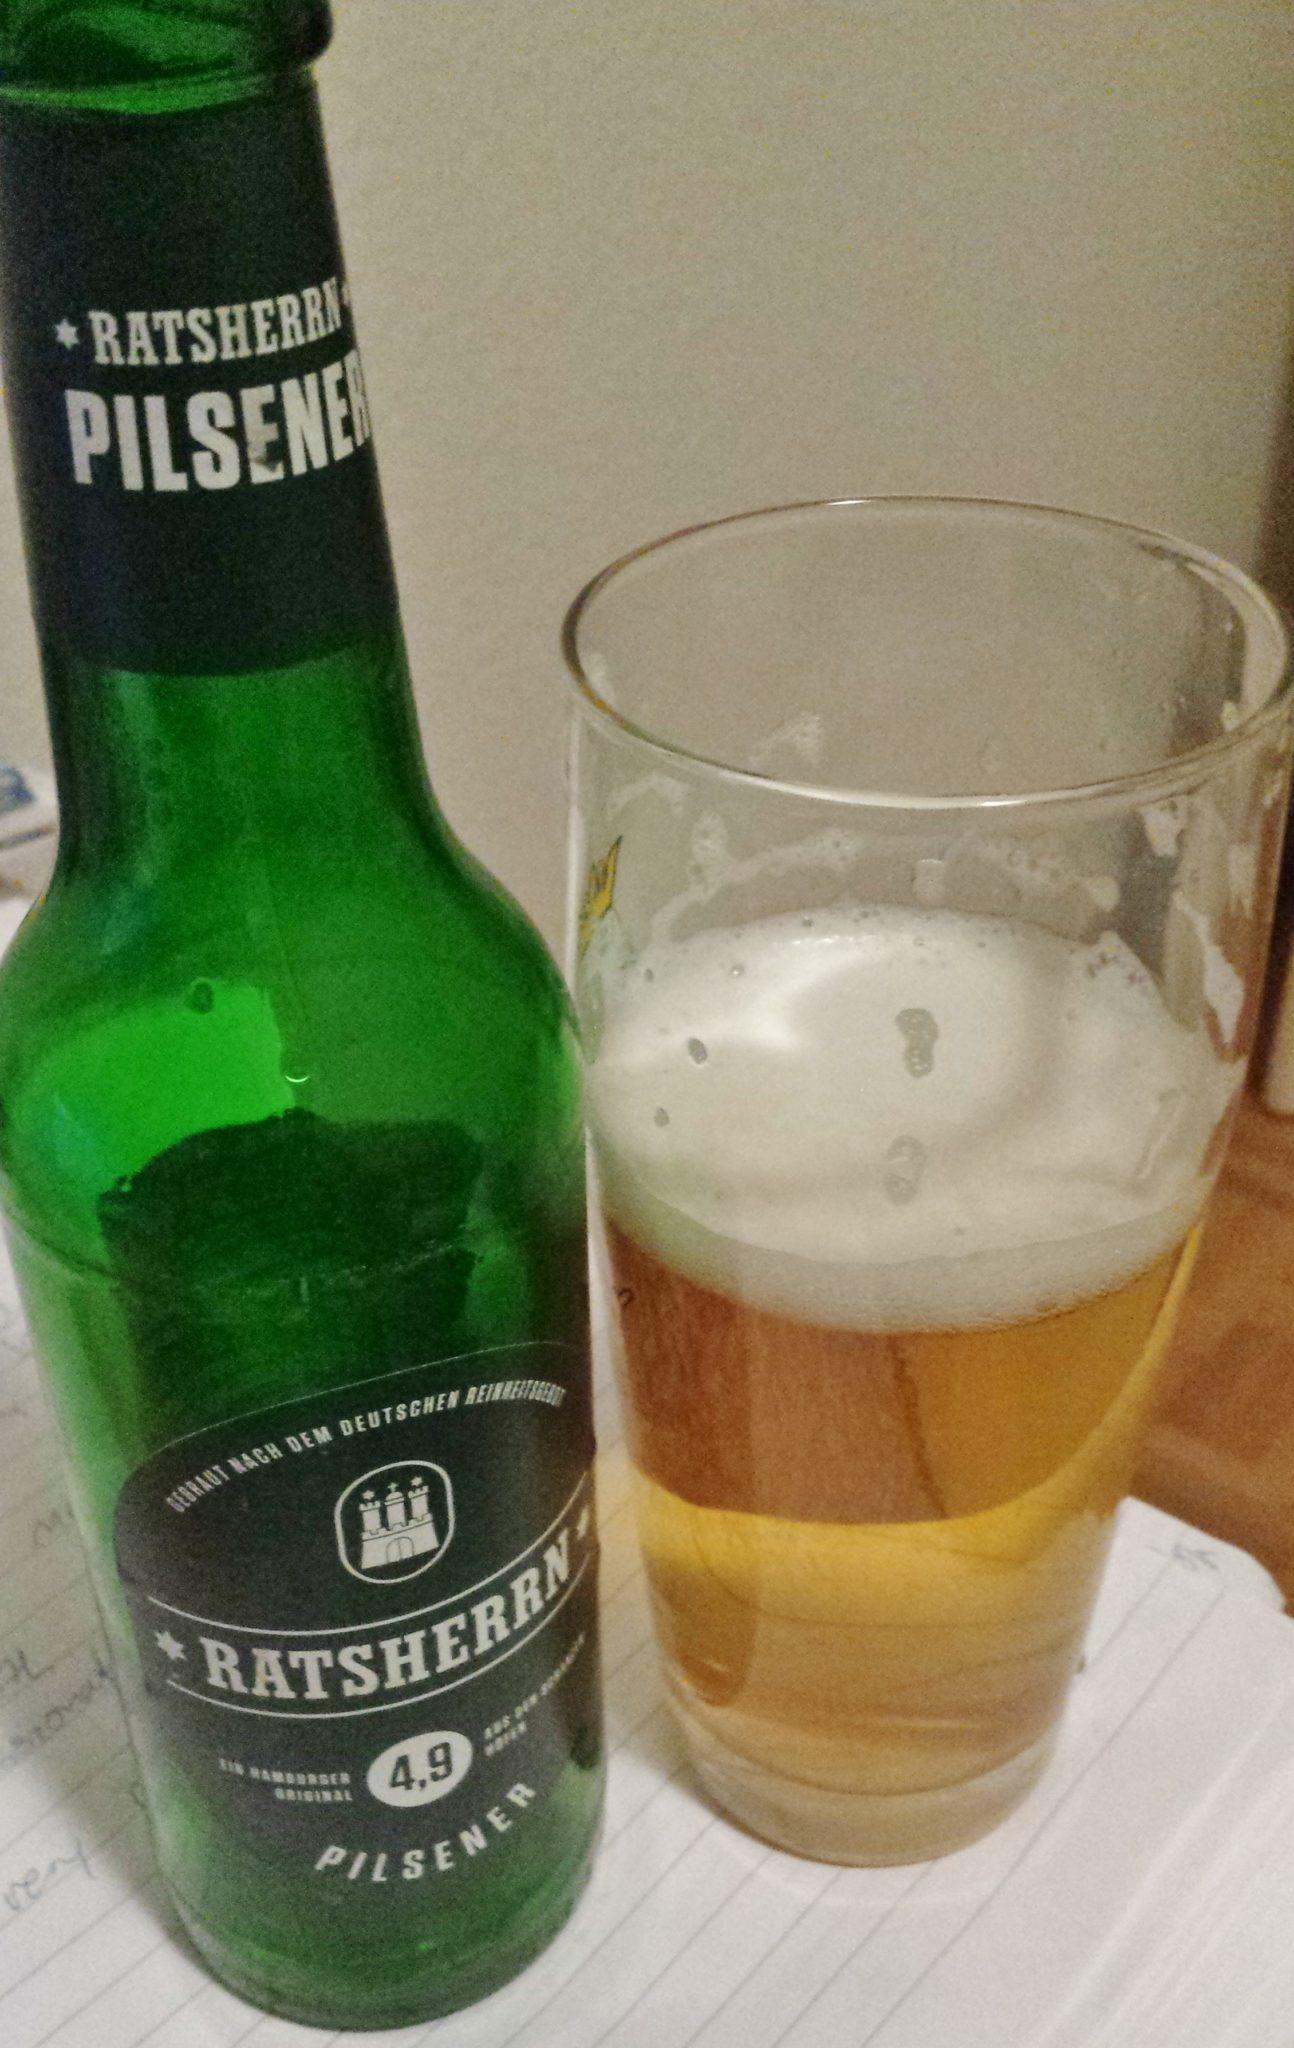 Ratsherrn Pilsner